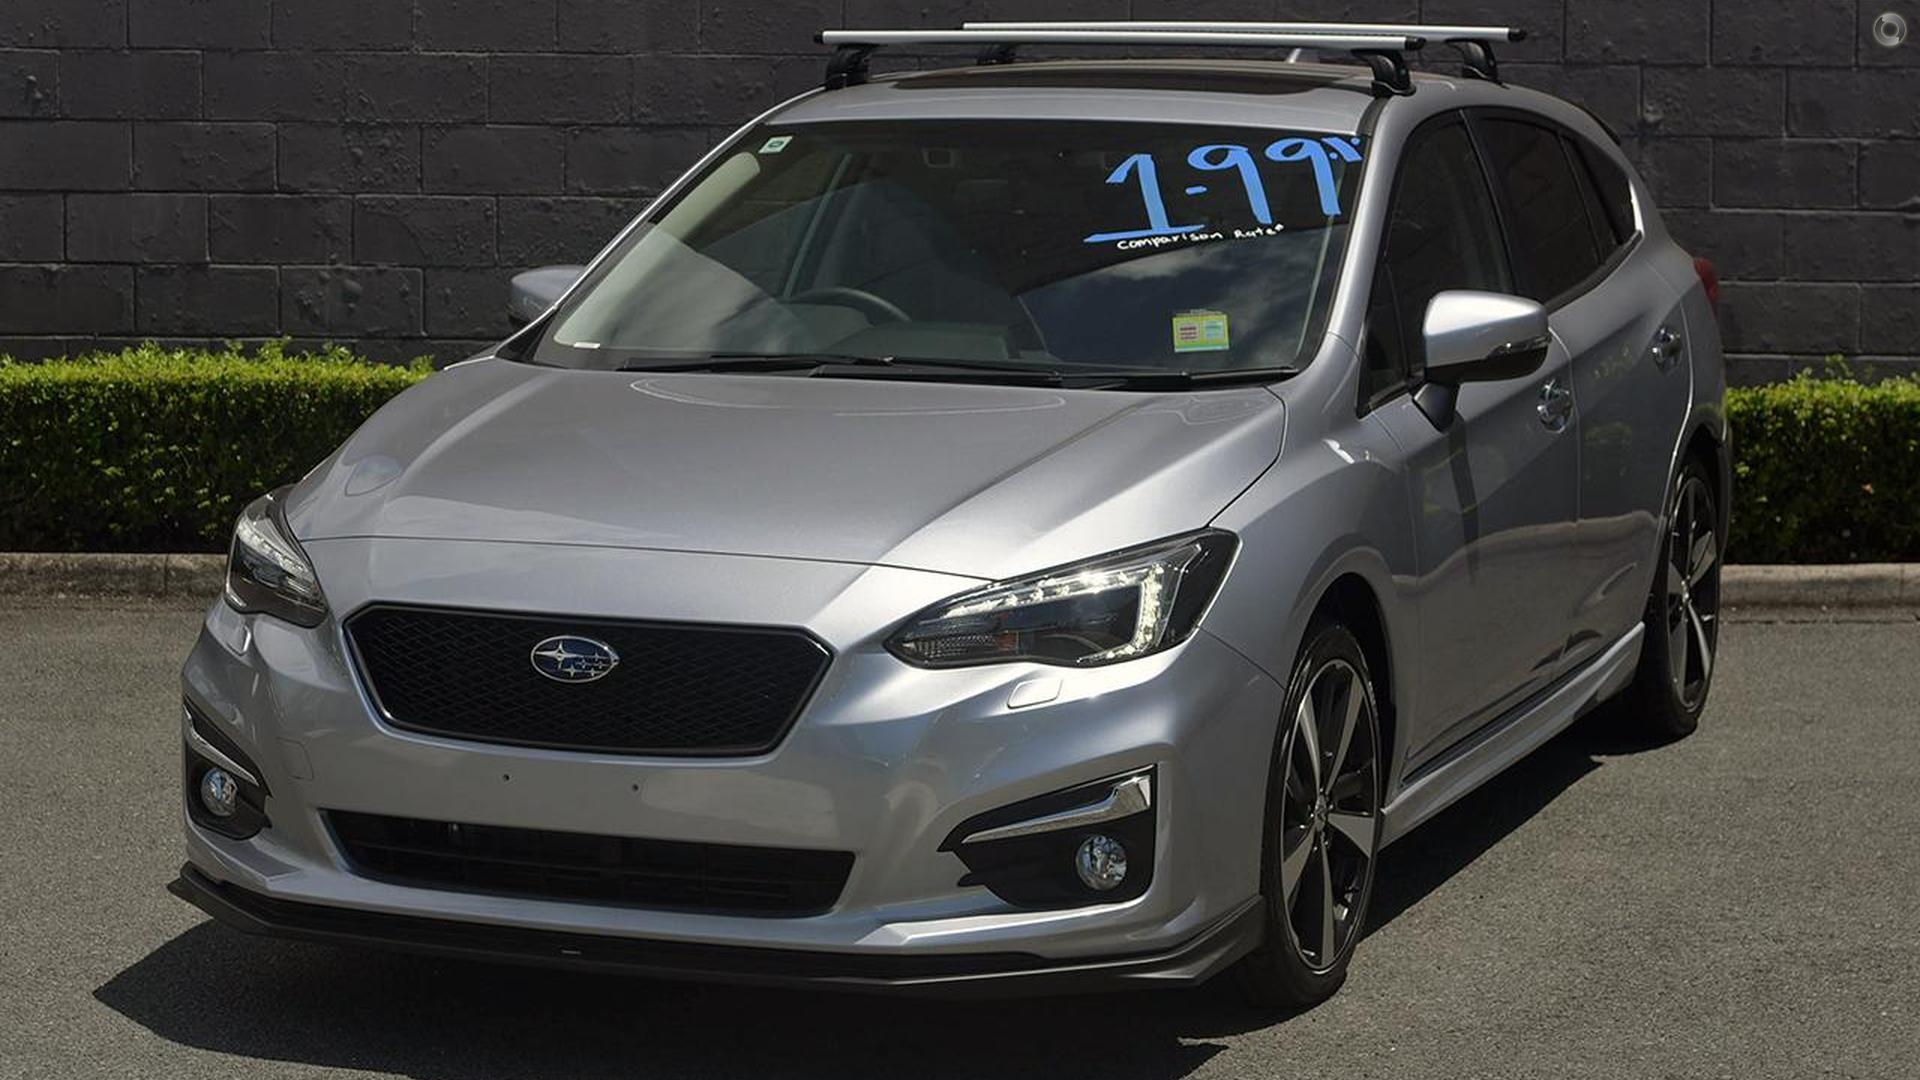 2018 Subaru Impreza G5